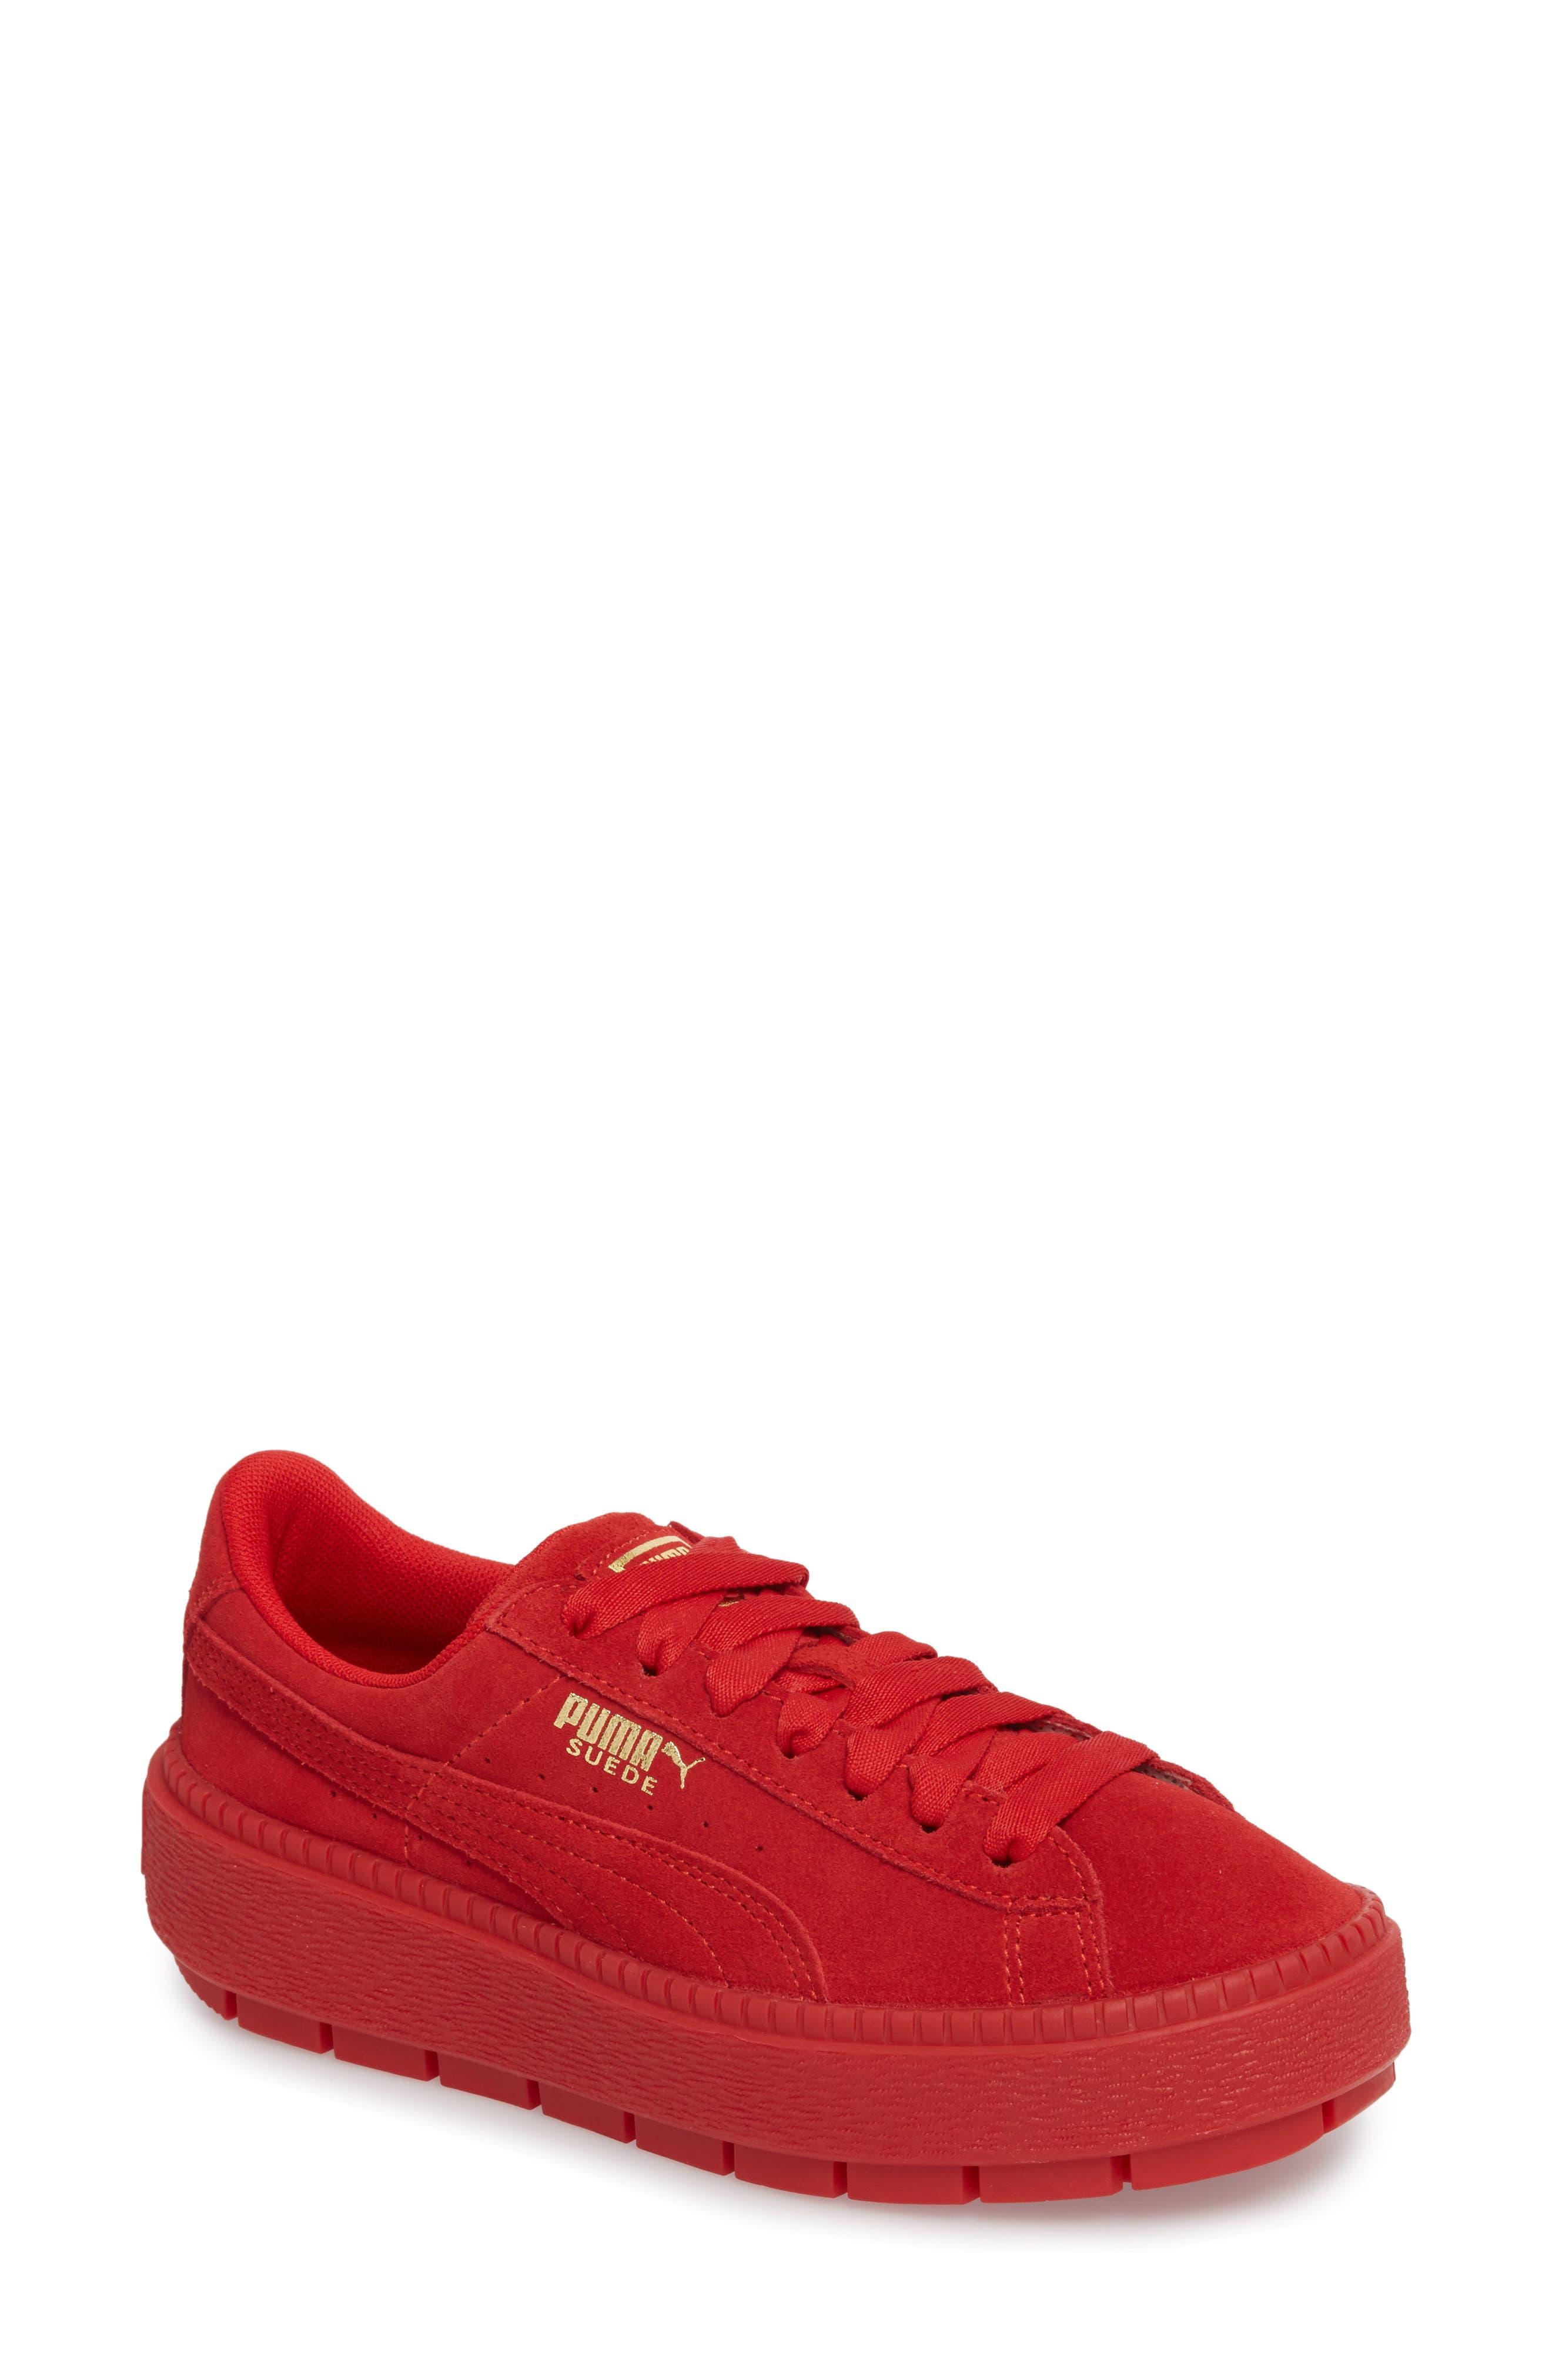 Main Image - PUMA Platform Trace Sneaker (Women)